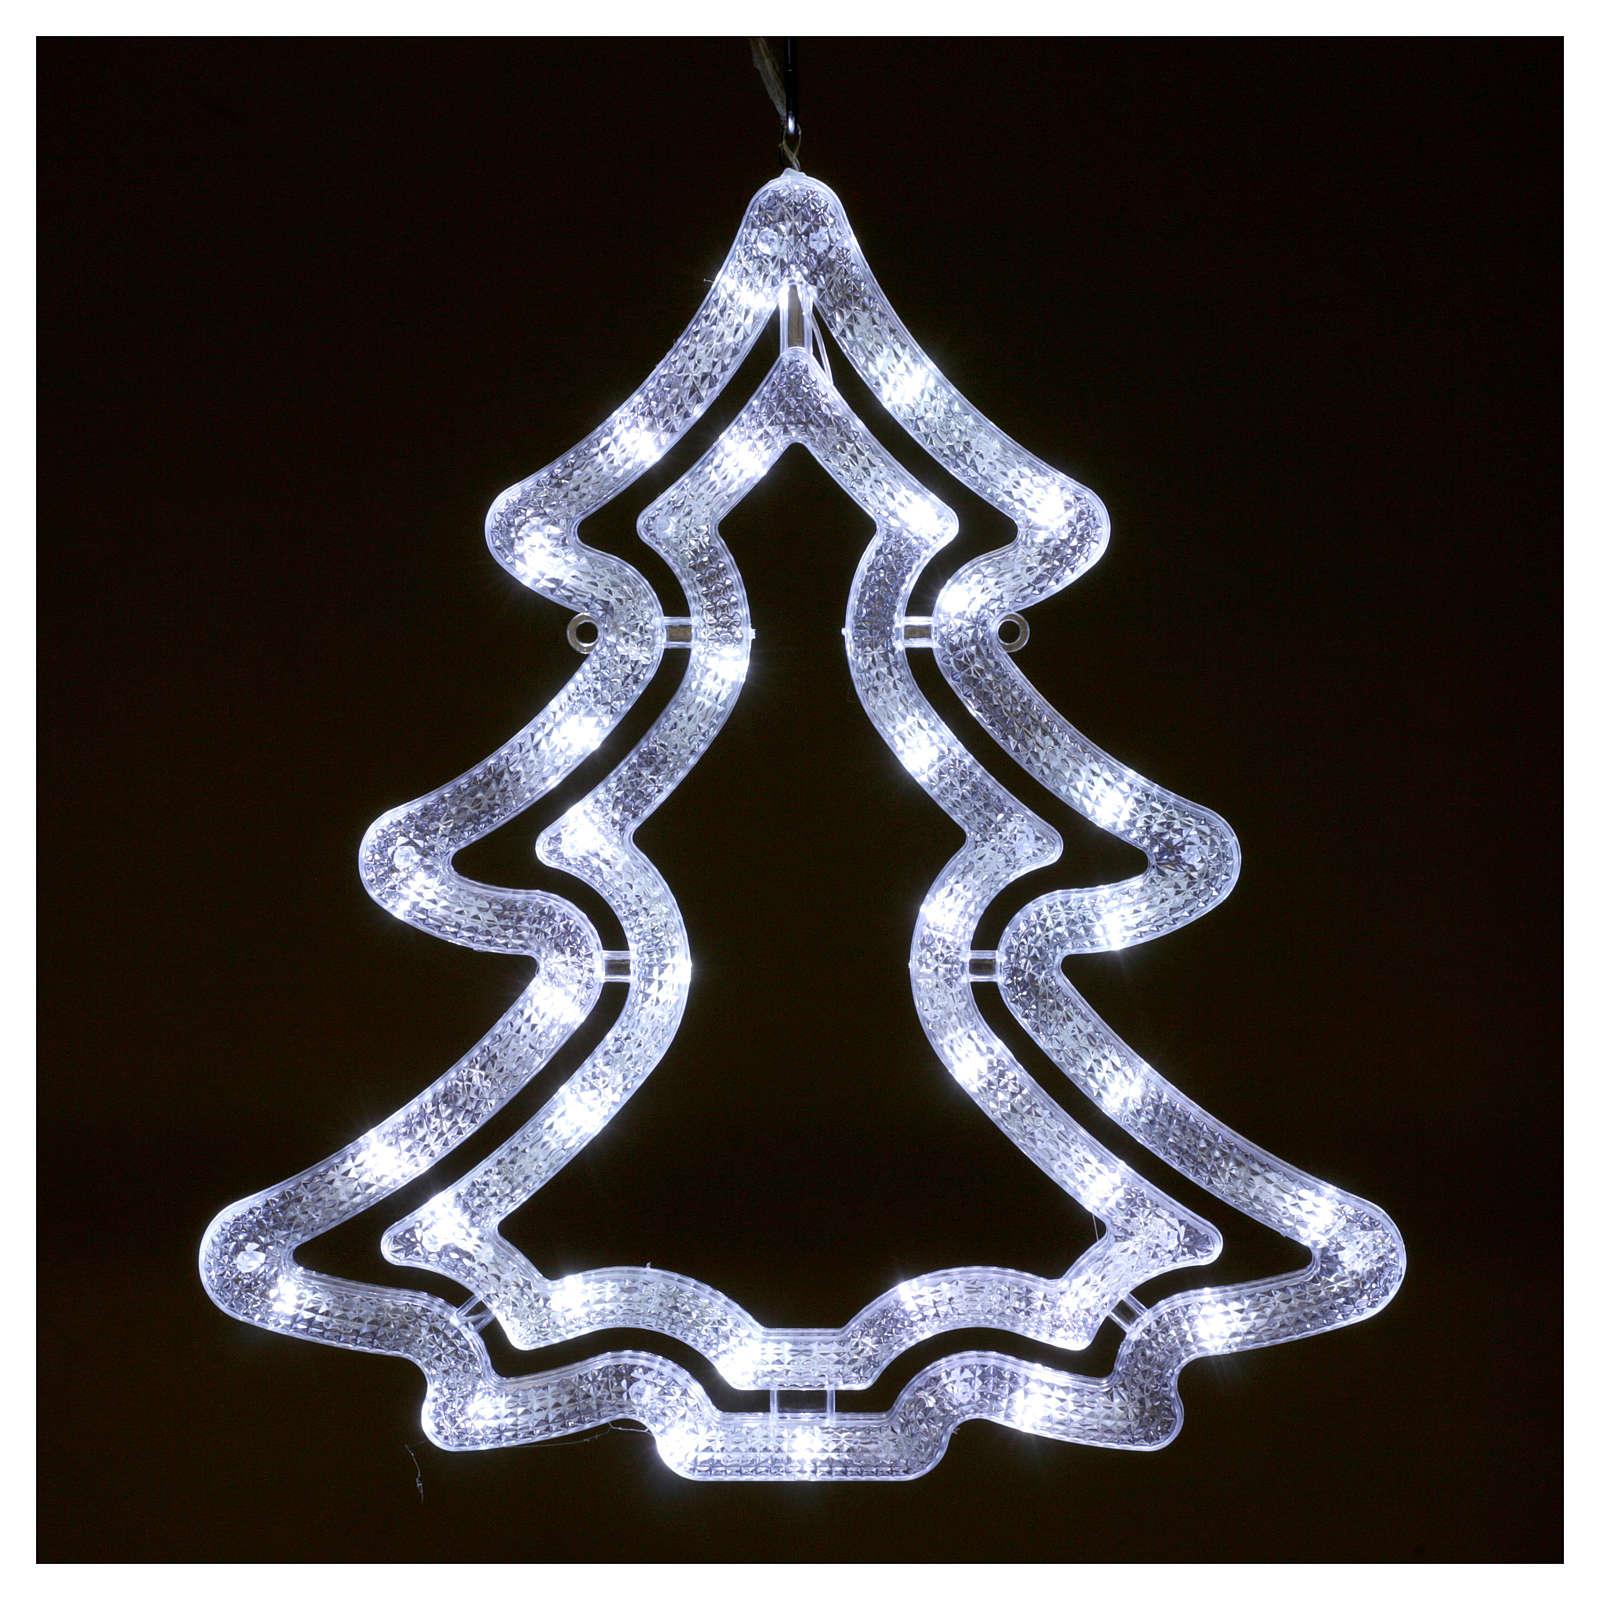 Illuminated tree 35 white led lights ice white internal and external use 3